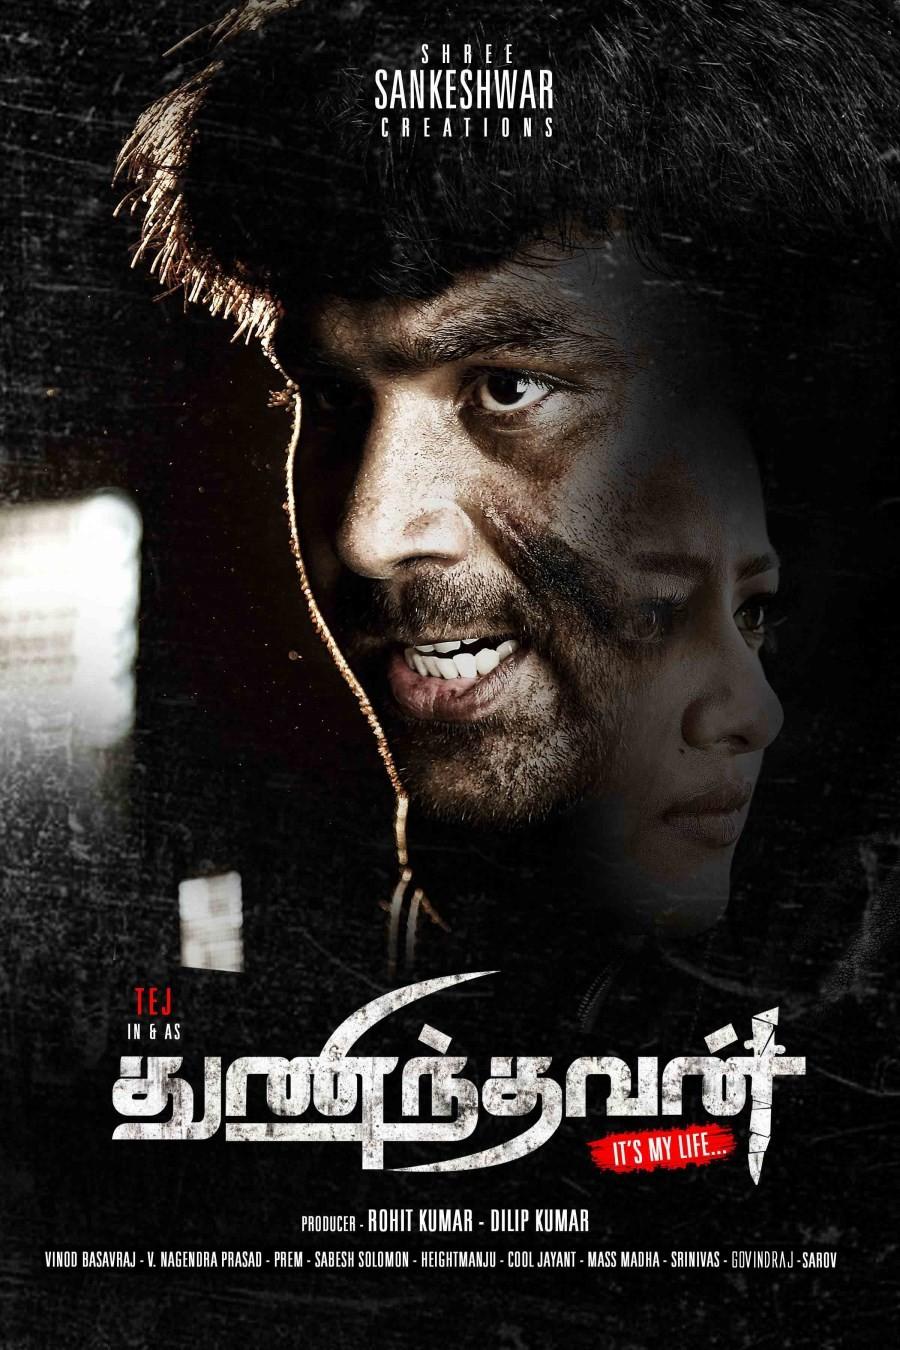 Thunindhavan,tamil movie Thunindhavan,Thunindhavan Movie Poster,Thunindhavan Movie Still,Thunindhavan Images,Thunindhavan Pictures,Thunindhavan Photos,Thunindhavan Poster